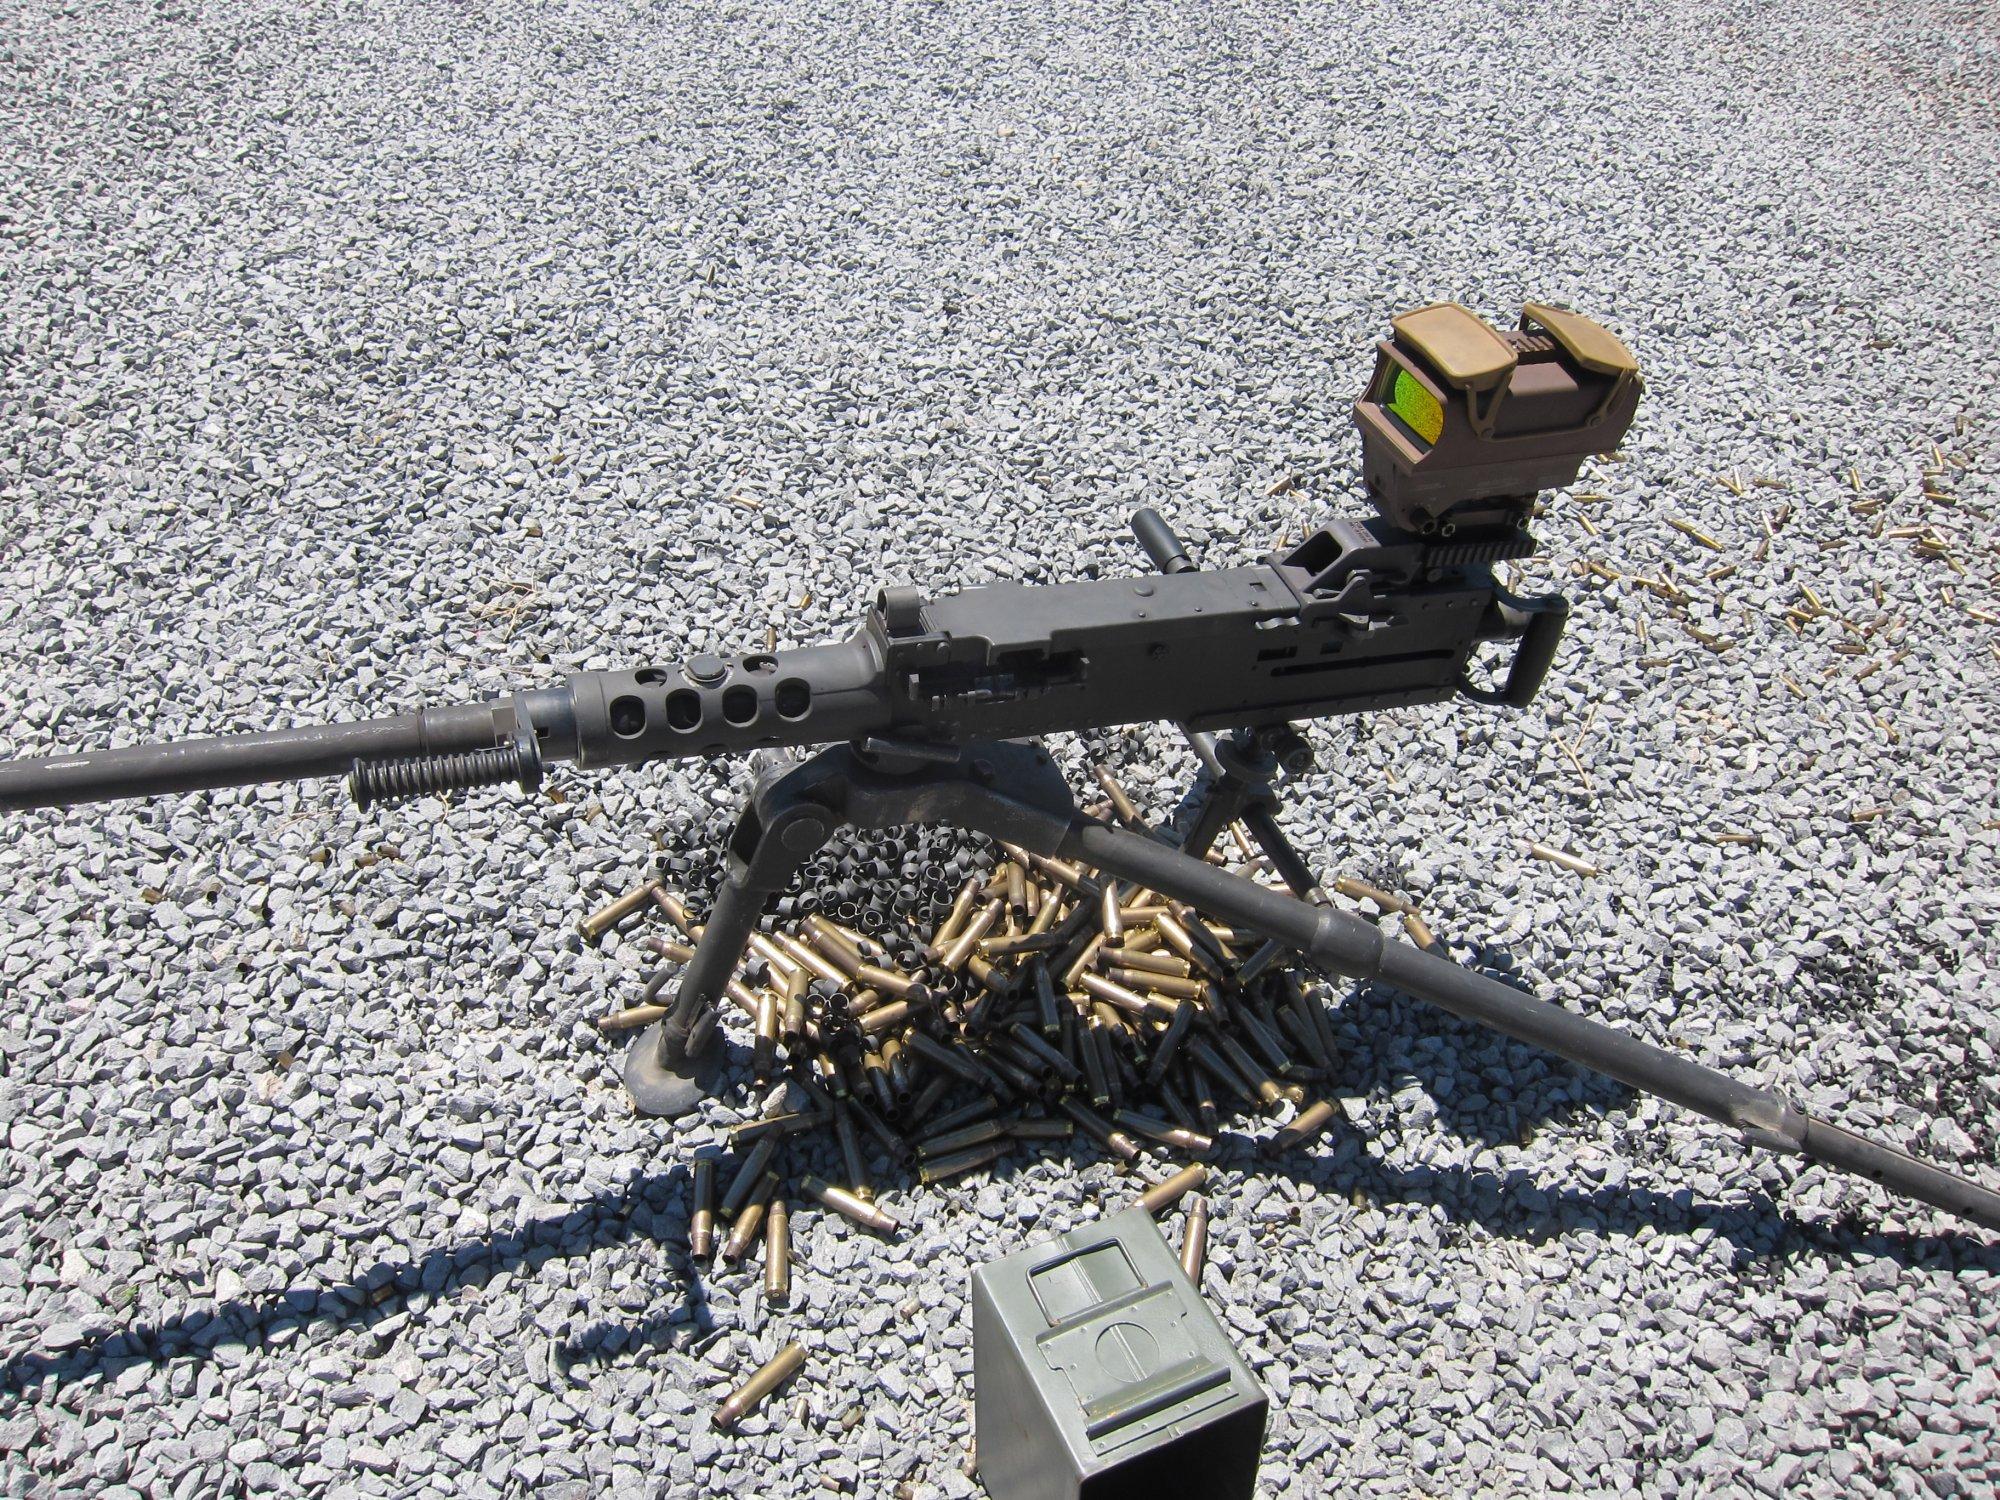 U.S. Ordnance M2HB QCB .50 BMG Heavy Machine Gun HMG David Crane Firing at Range DefenseReview.com DR 6 <!  :en  >U.S. Ordnance M2HB QCB (Quick Change Barrel) Ma Deuce .50 BMG Heavy Machine Gun (HMG) Equipped with Raytheon ELCAN SpecterHR Wide View Dual Red Dot Optical Gunsight Gets Test Fired at the Range (Video!)<!  :  >